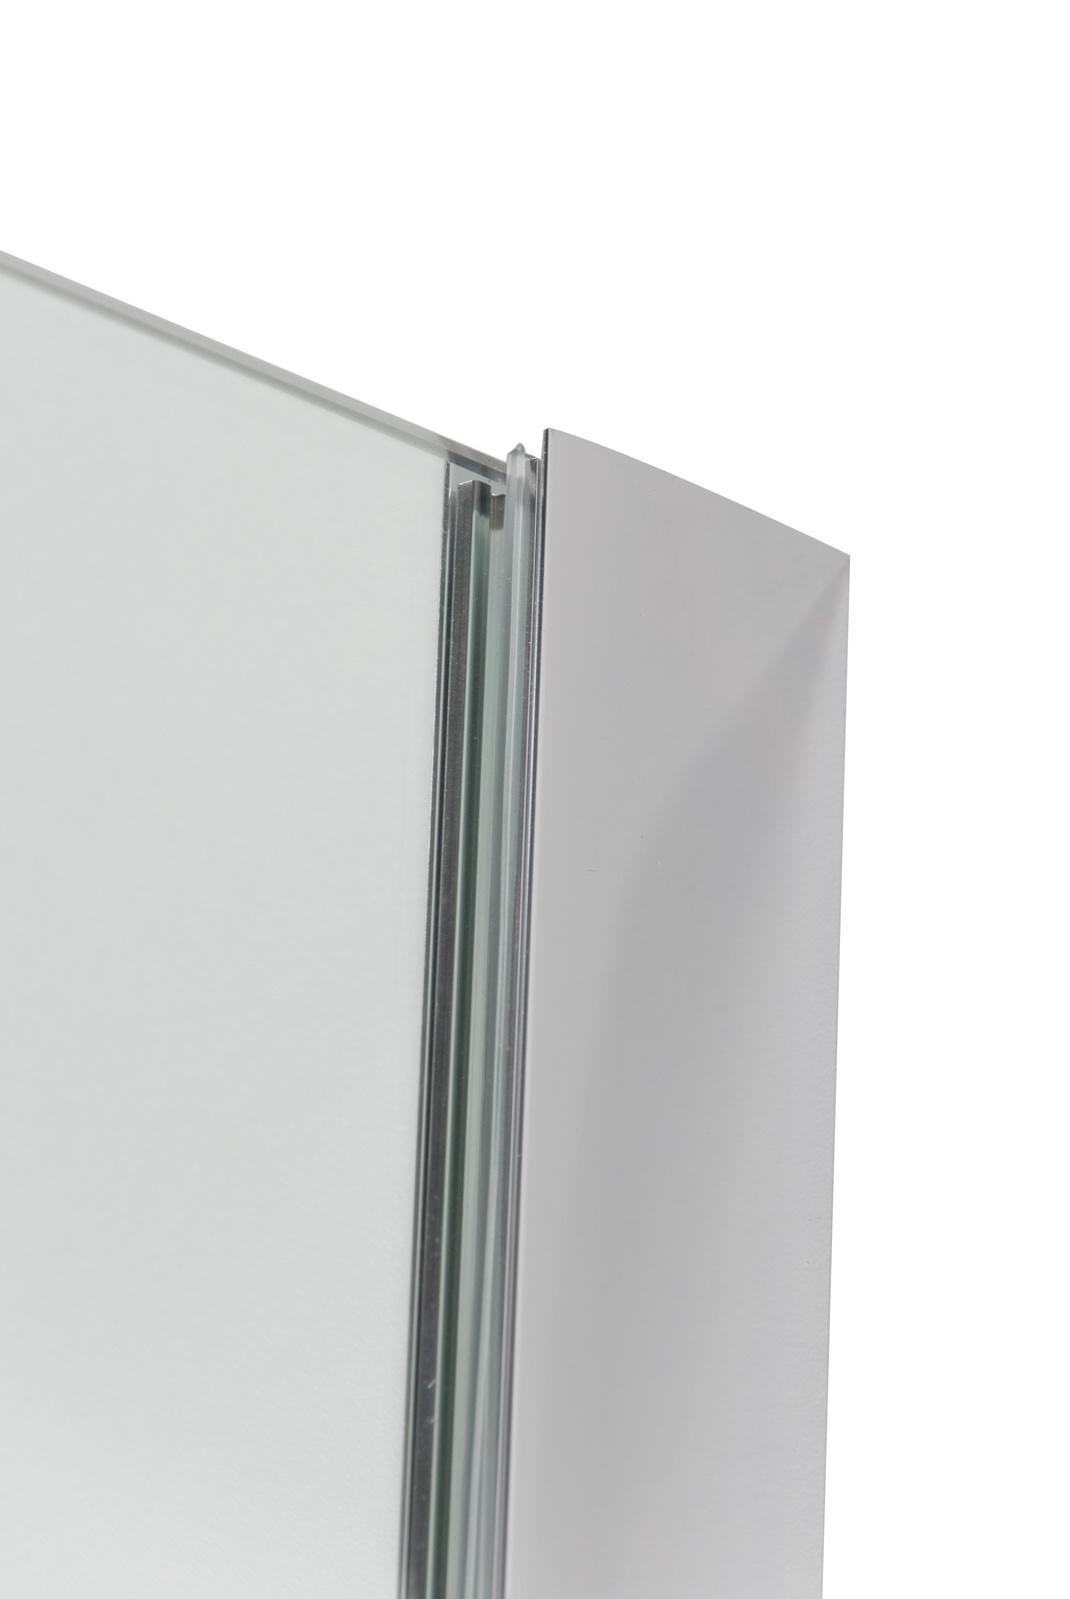 Linea Uno Ebenerdige Dusche Linea Uno 150 x 200 cm